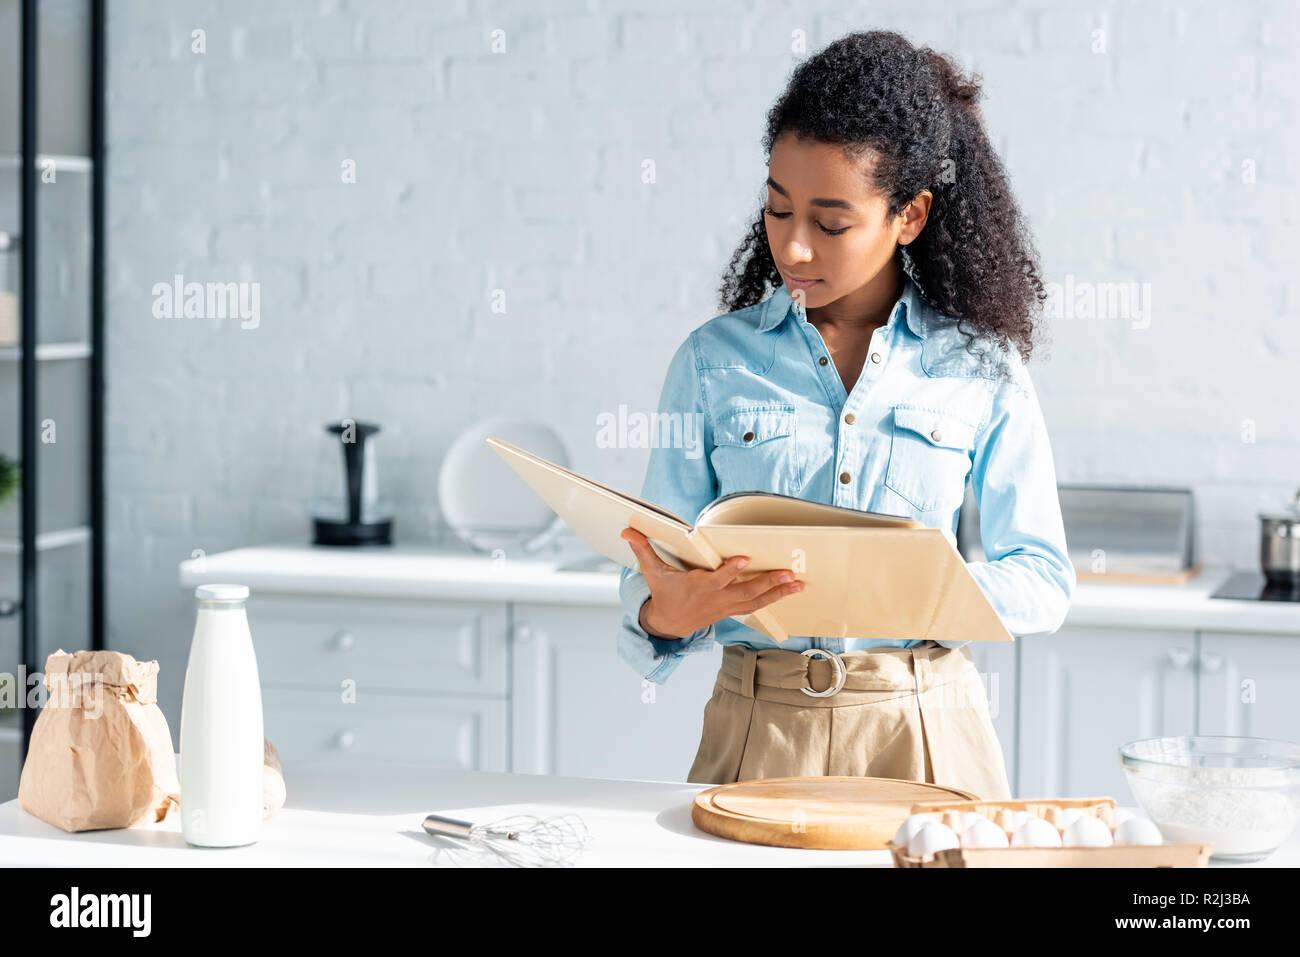 Attraktive african american woman reading Kochbuch in der Küche Stockbild